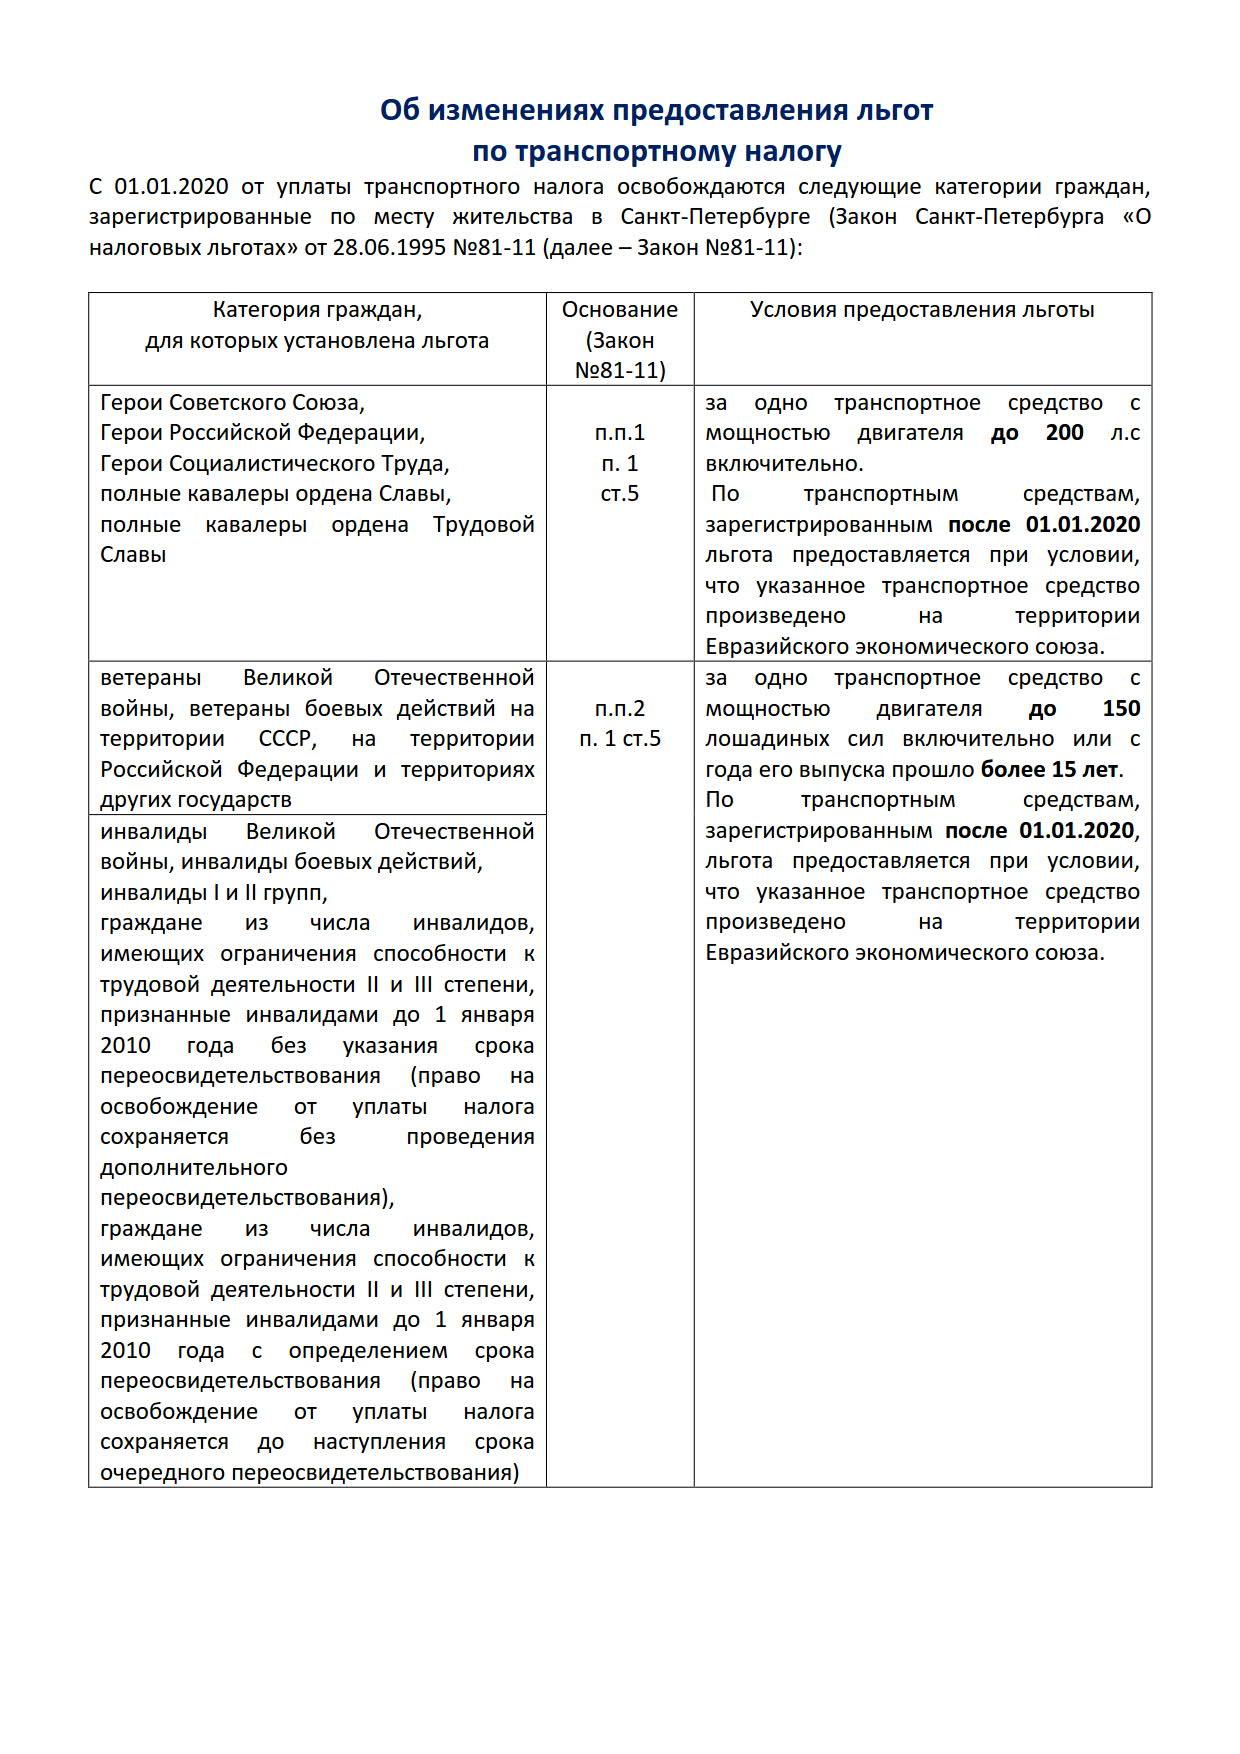 43_Льготы Транспорт 2020_1